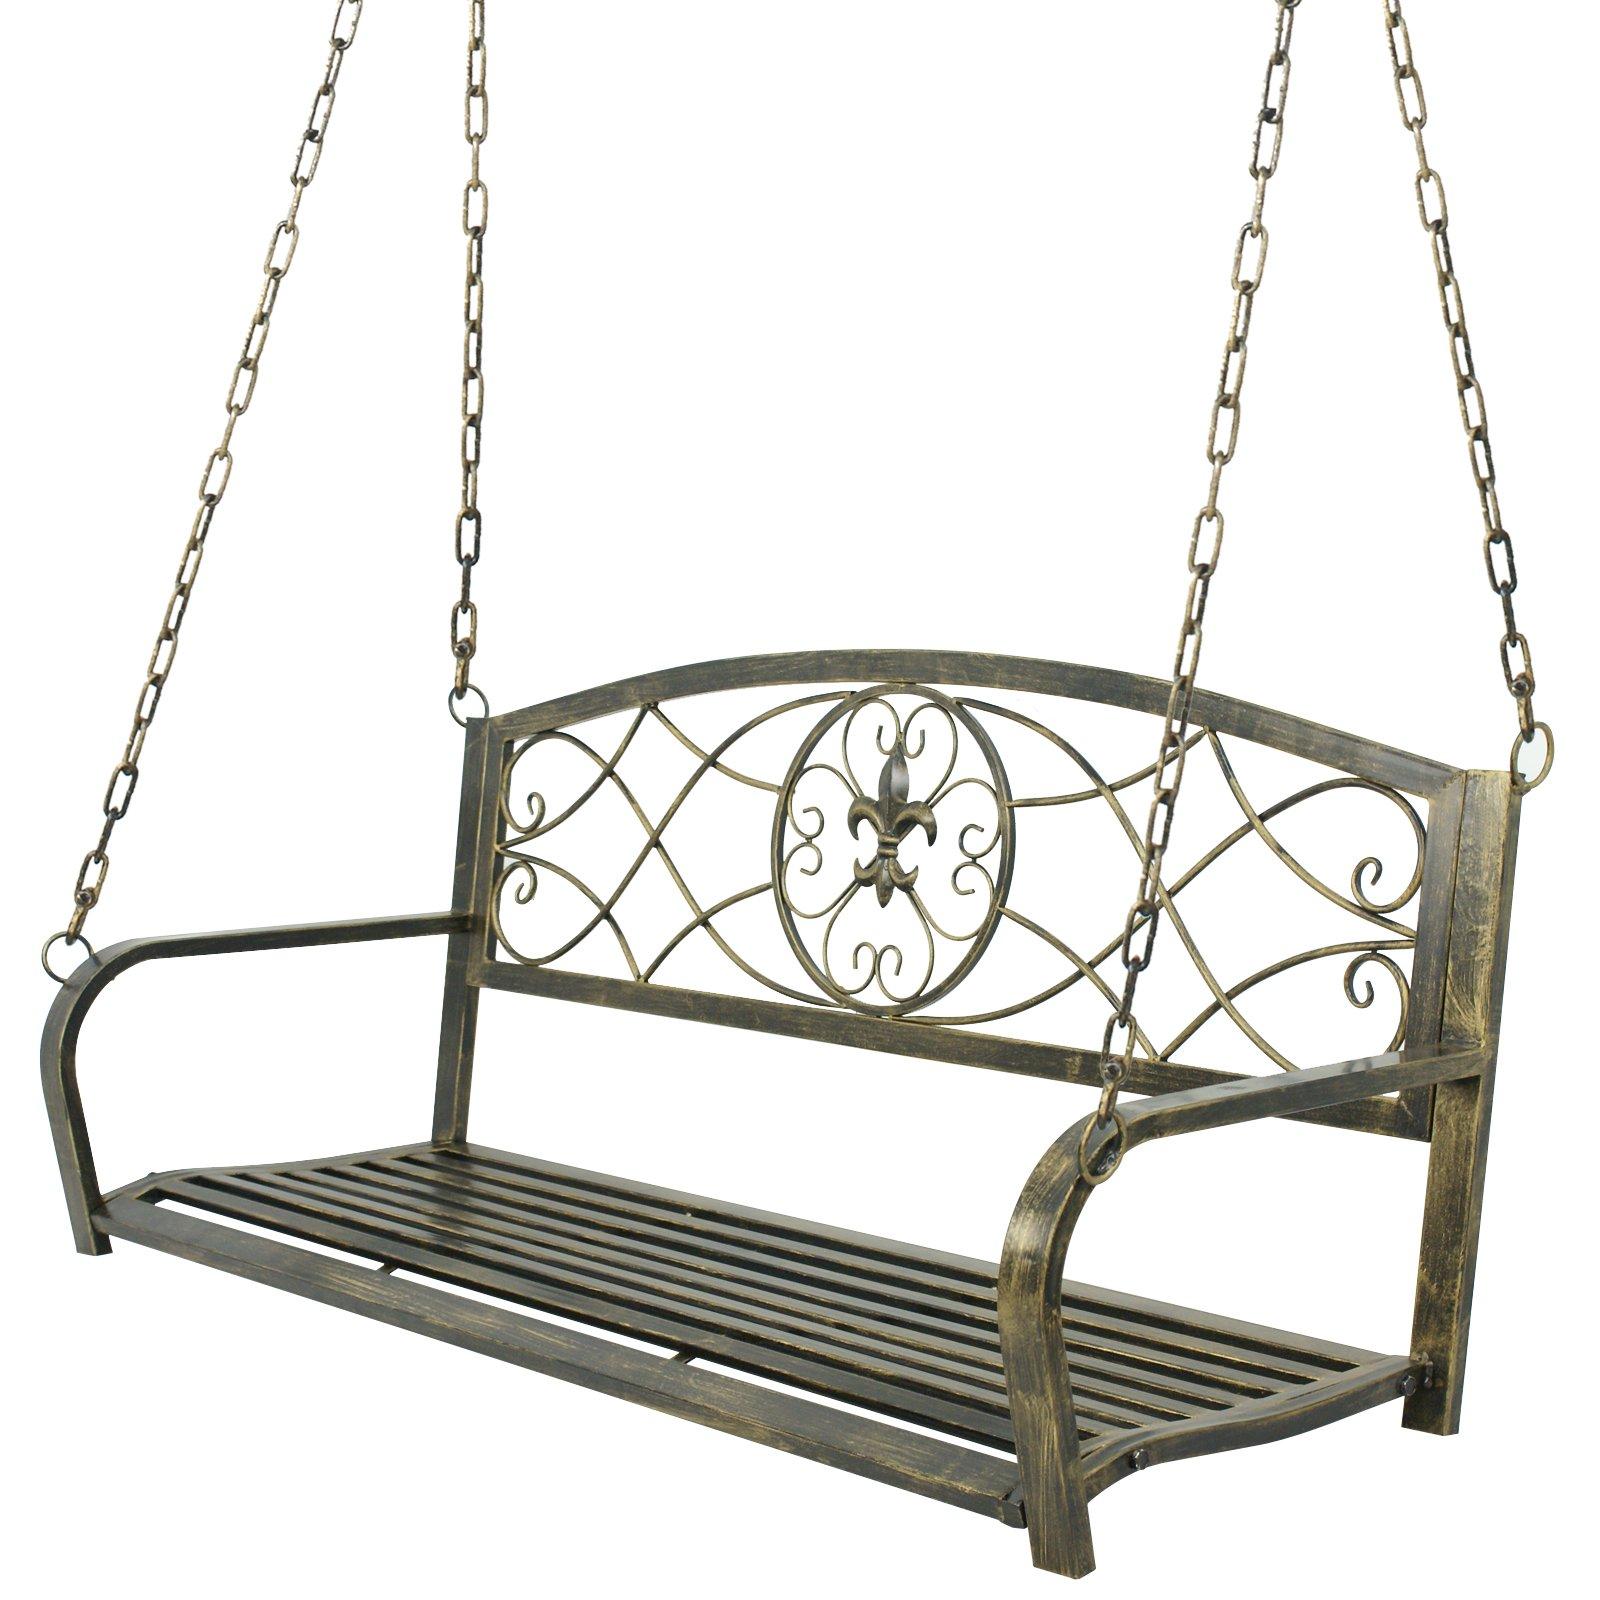 HomGarden Iron Porch Swing Patio Hanging Chair Bench Seat Outdoor Decor Garden Furniture